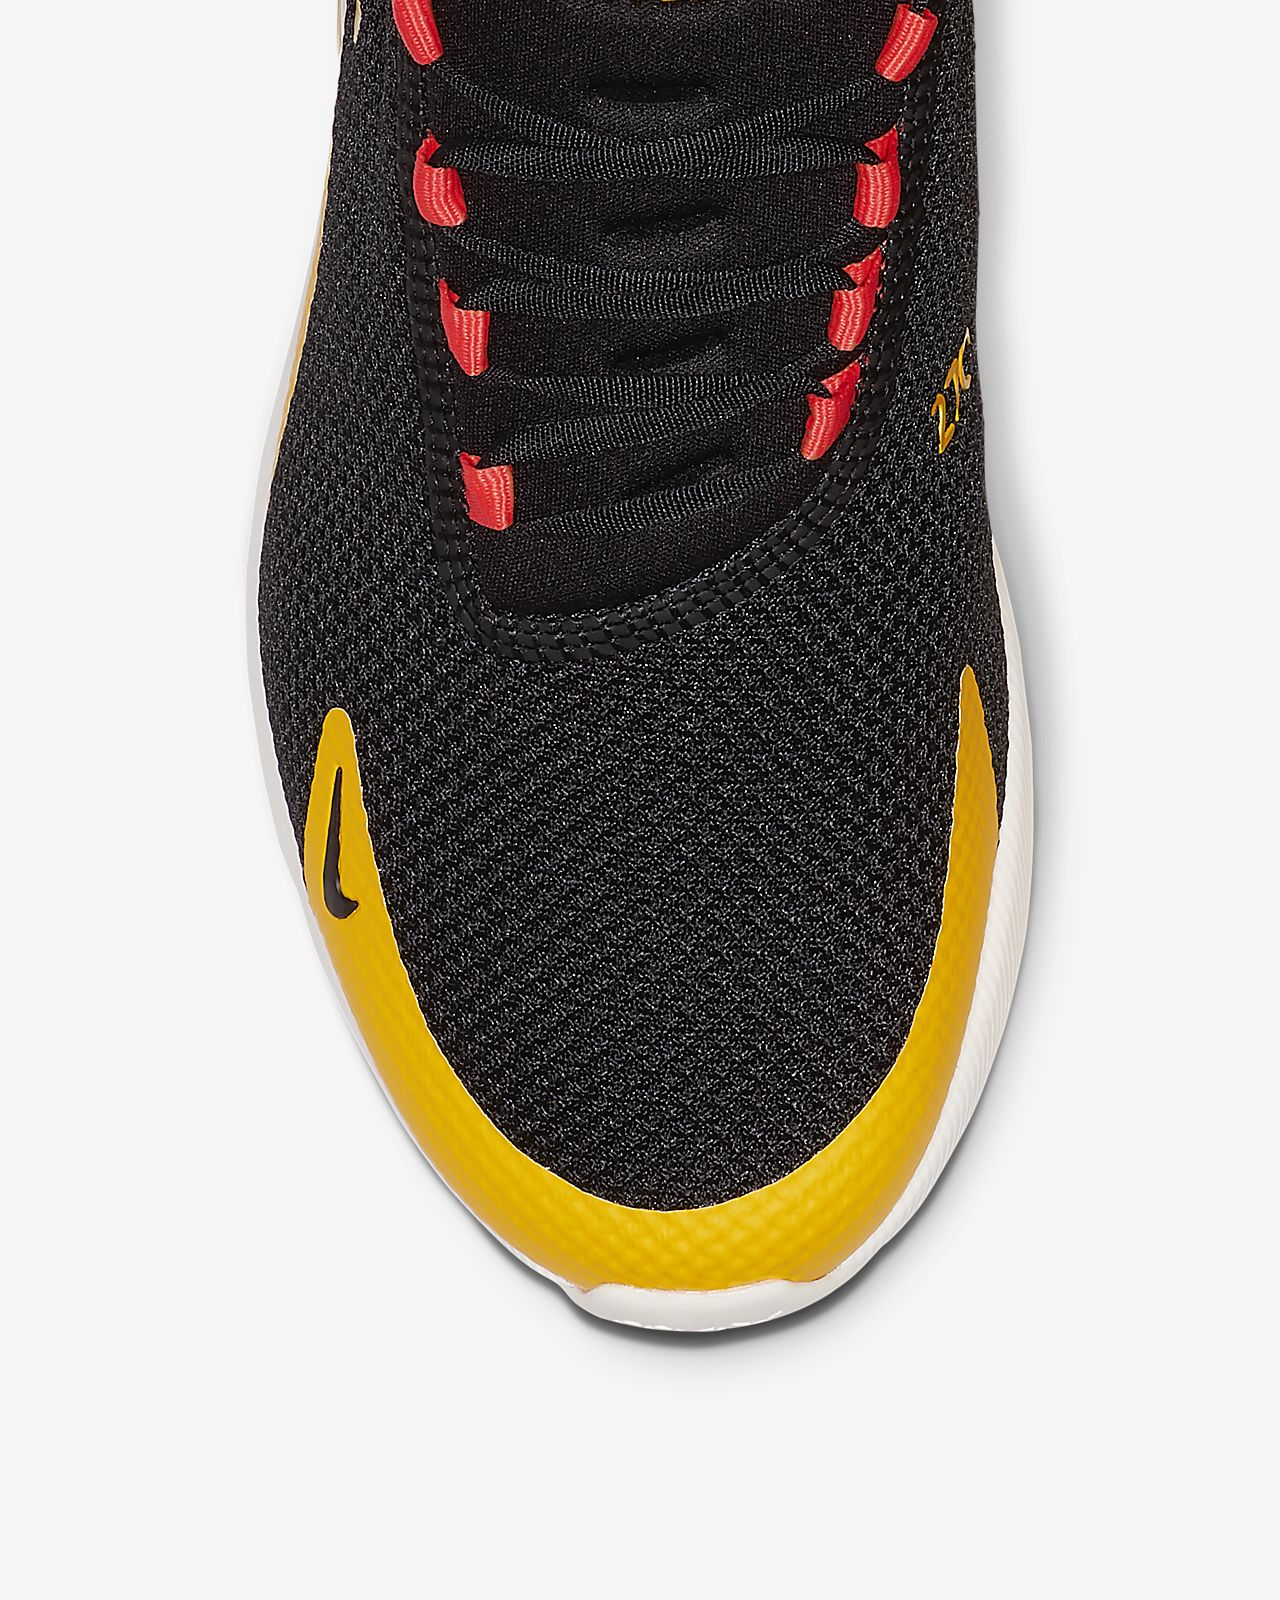 the latest 20e54 18a30 ... Nike Air Max 270 SE Floral Women s Shoe